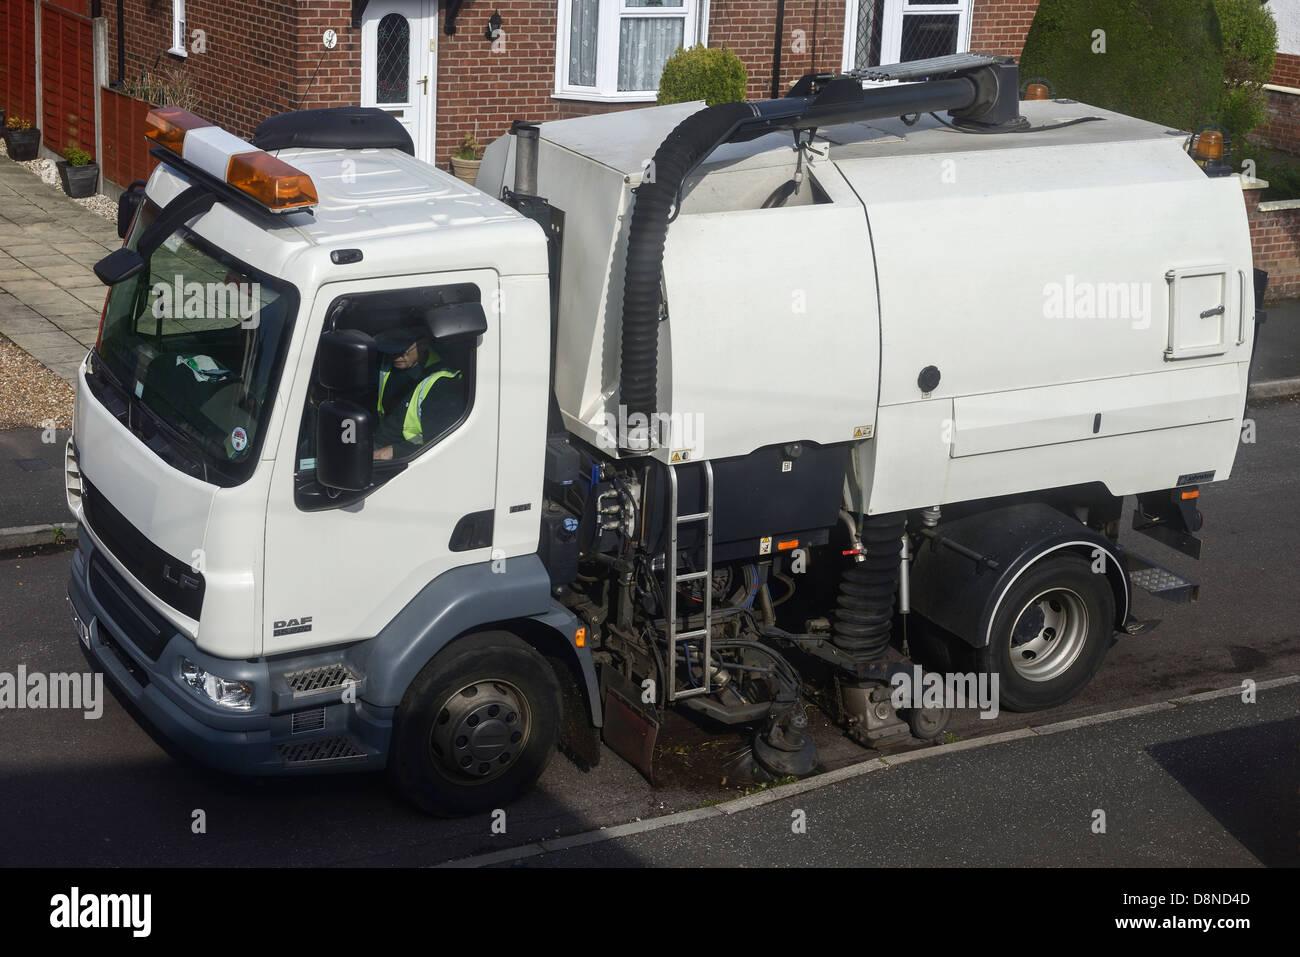 Carretera vehículo de barrido Imagen De Stock